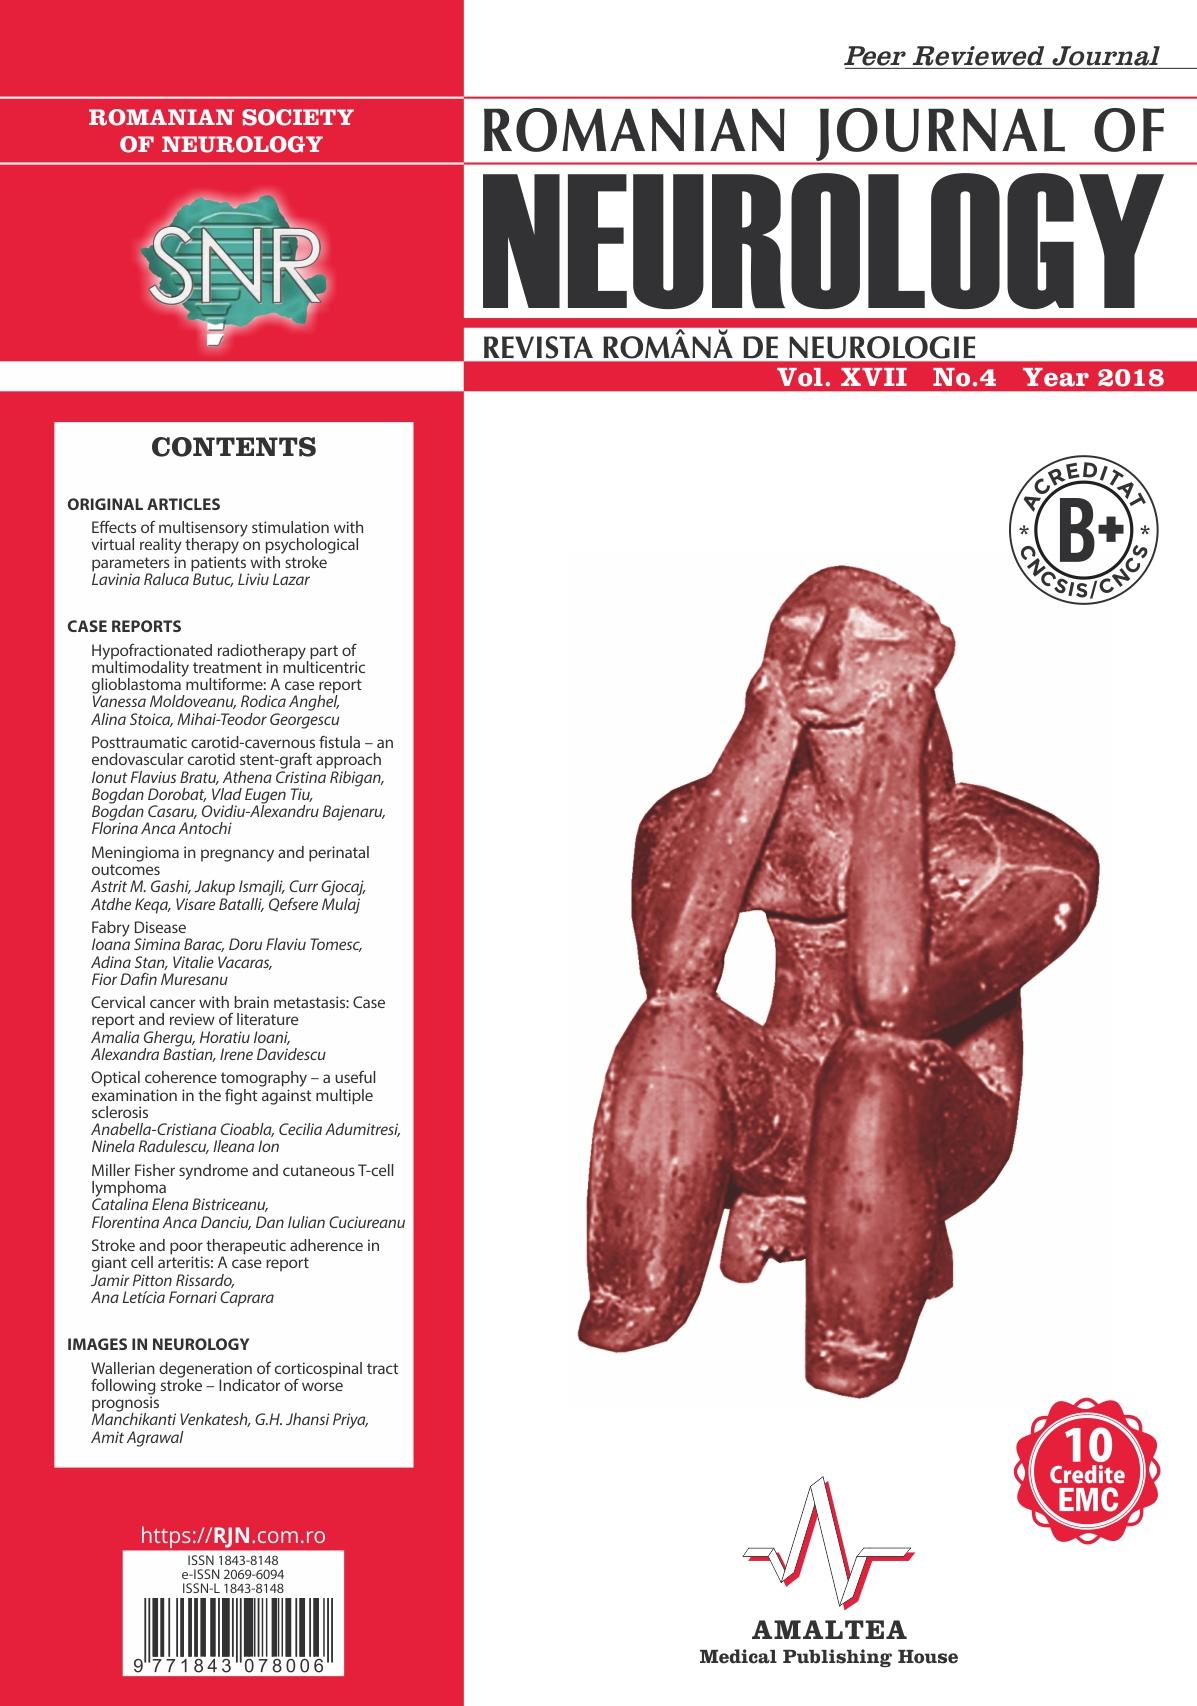 Romanian Journal of Neurology, Volume XVII, No. 4, 2018